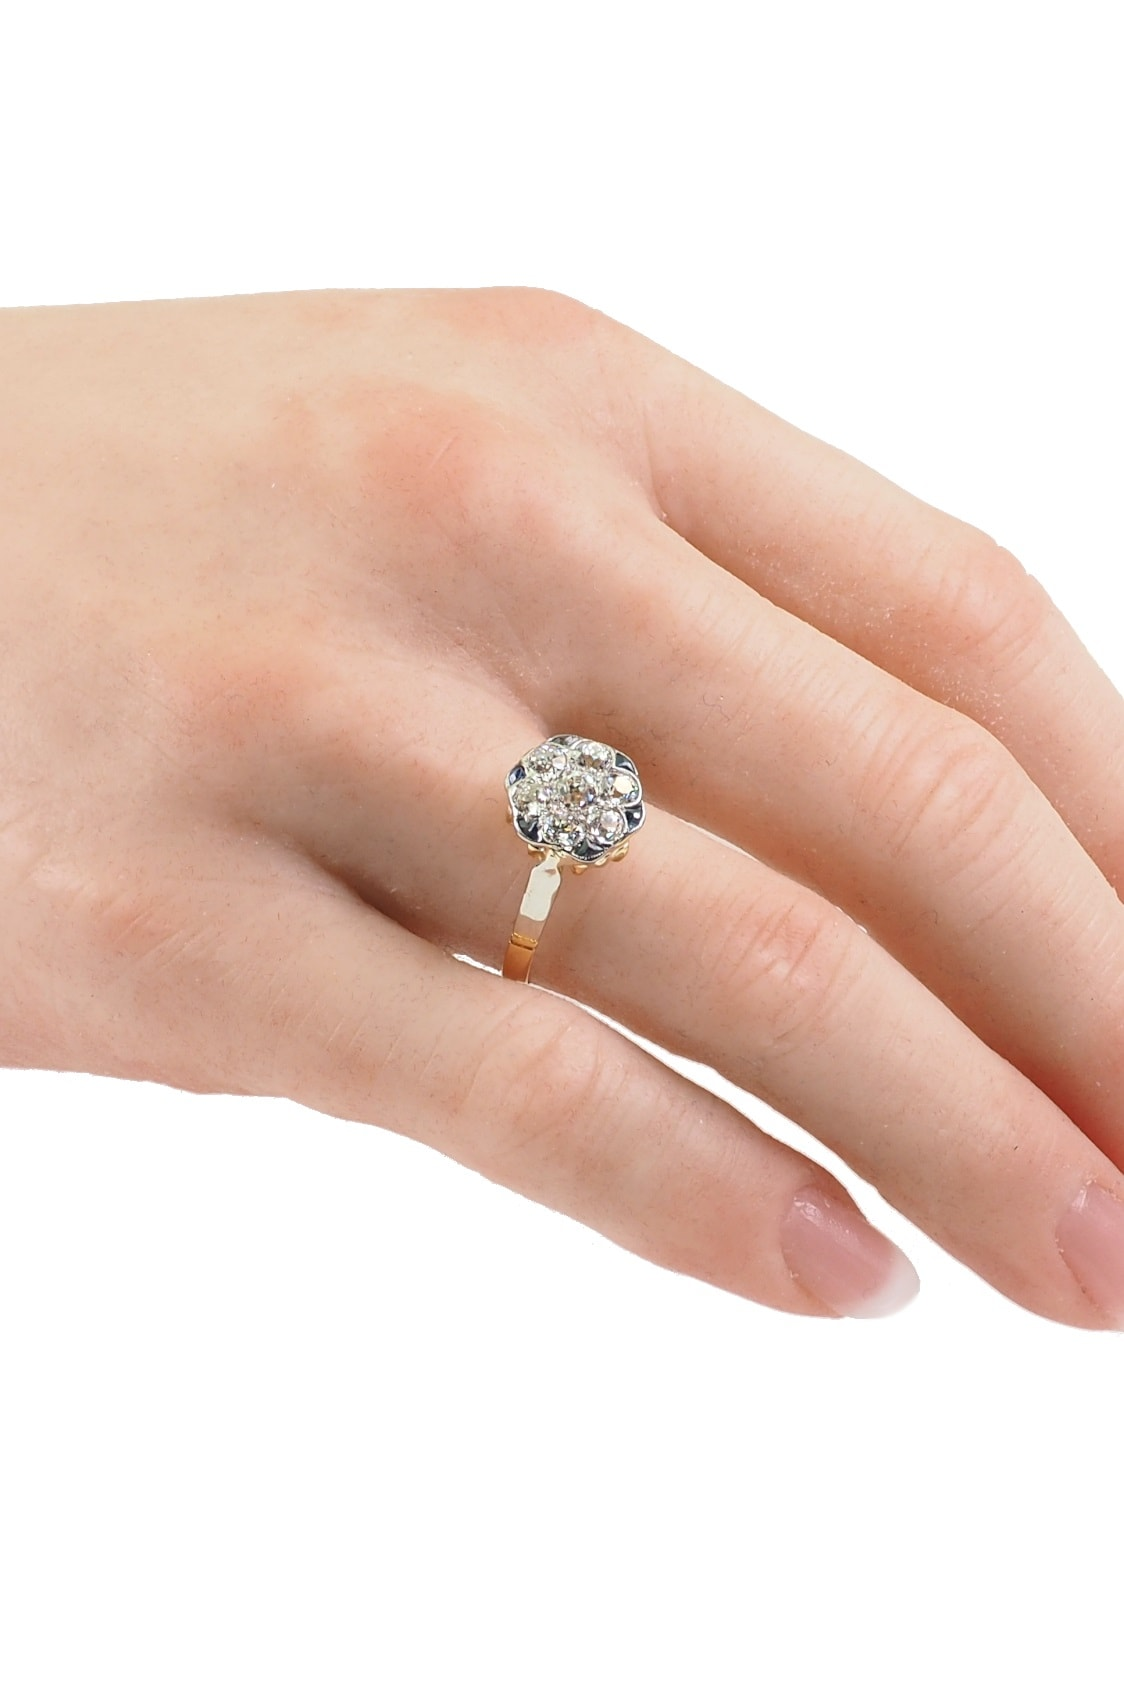 0424-Rheinfrank-Diamantring